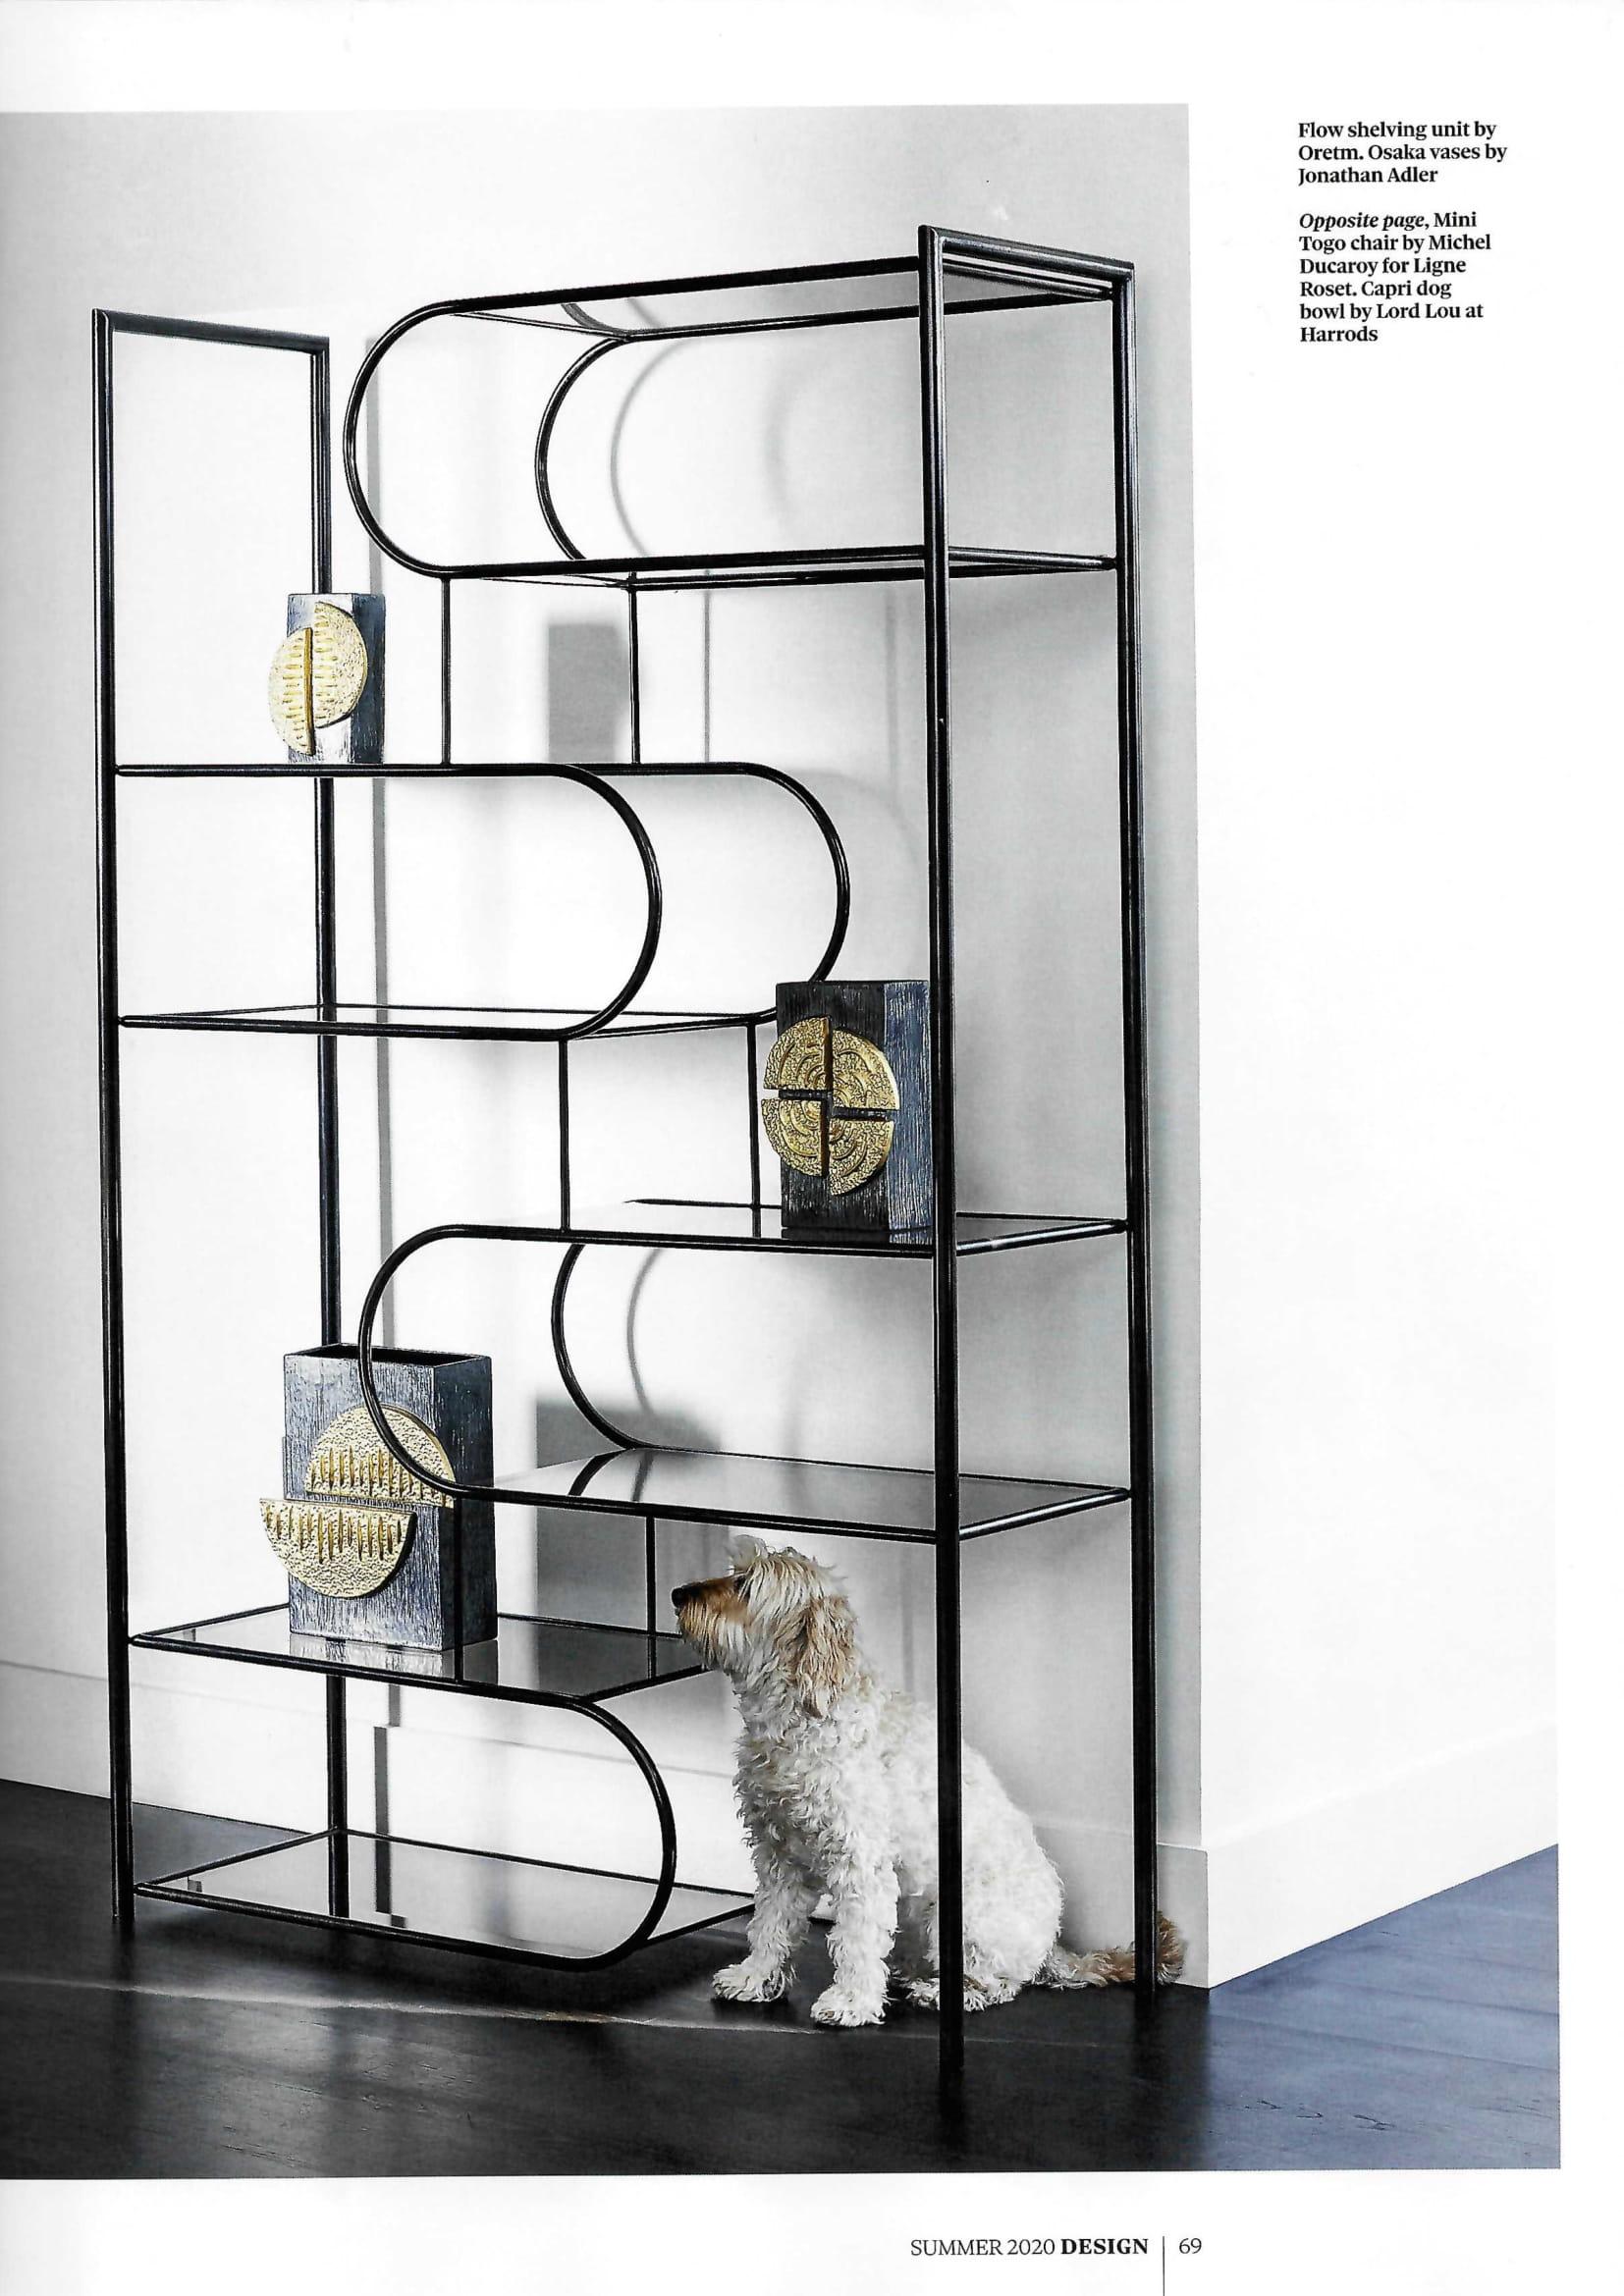 It's a (double) dog's life in The Observer's Design supplement, with Jonathan Adler's Brutalist-inspired Osaka vases...